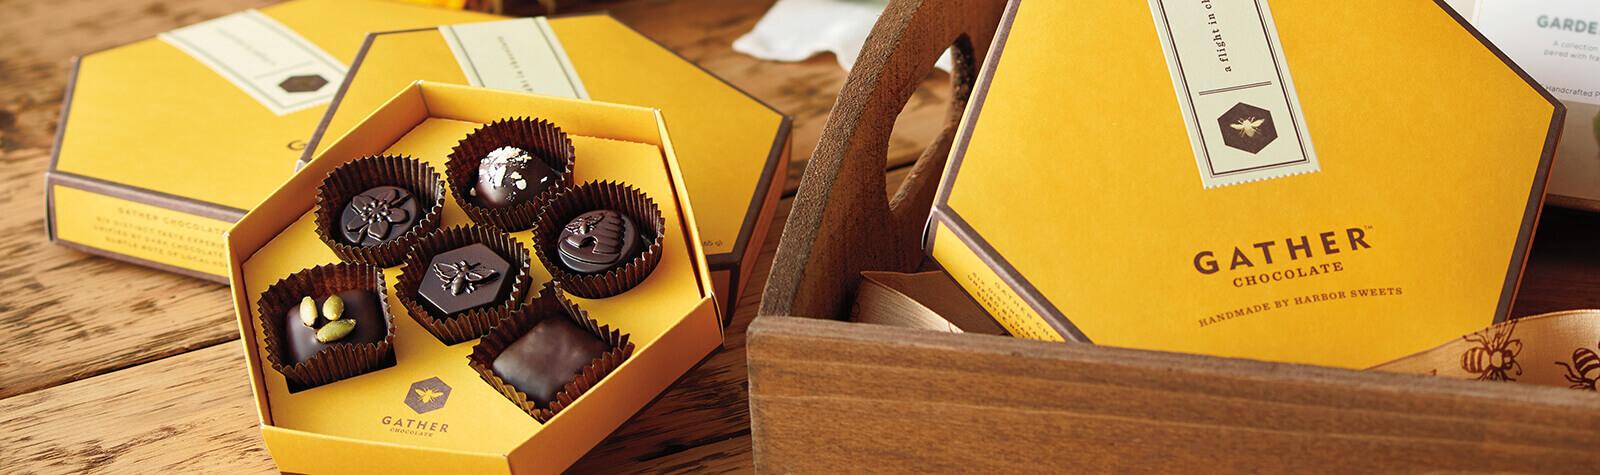 Gather Chocolates - Harbor Sweets